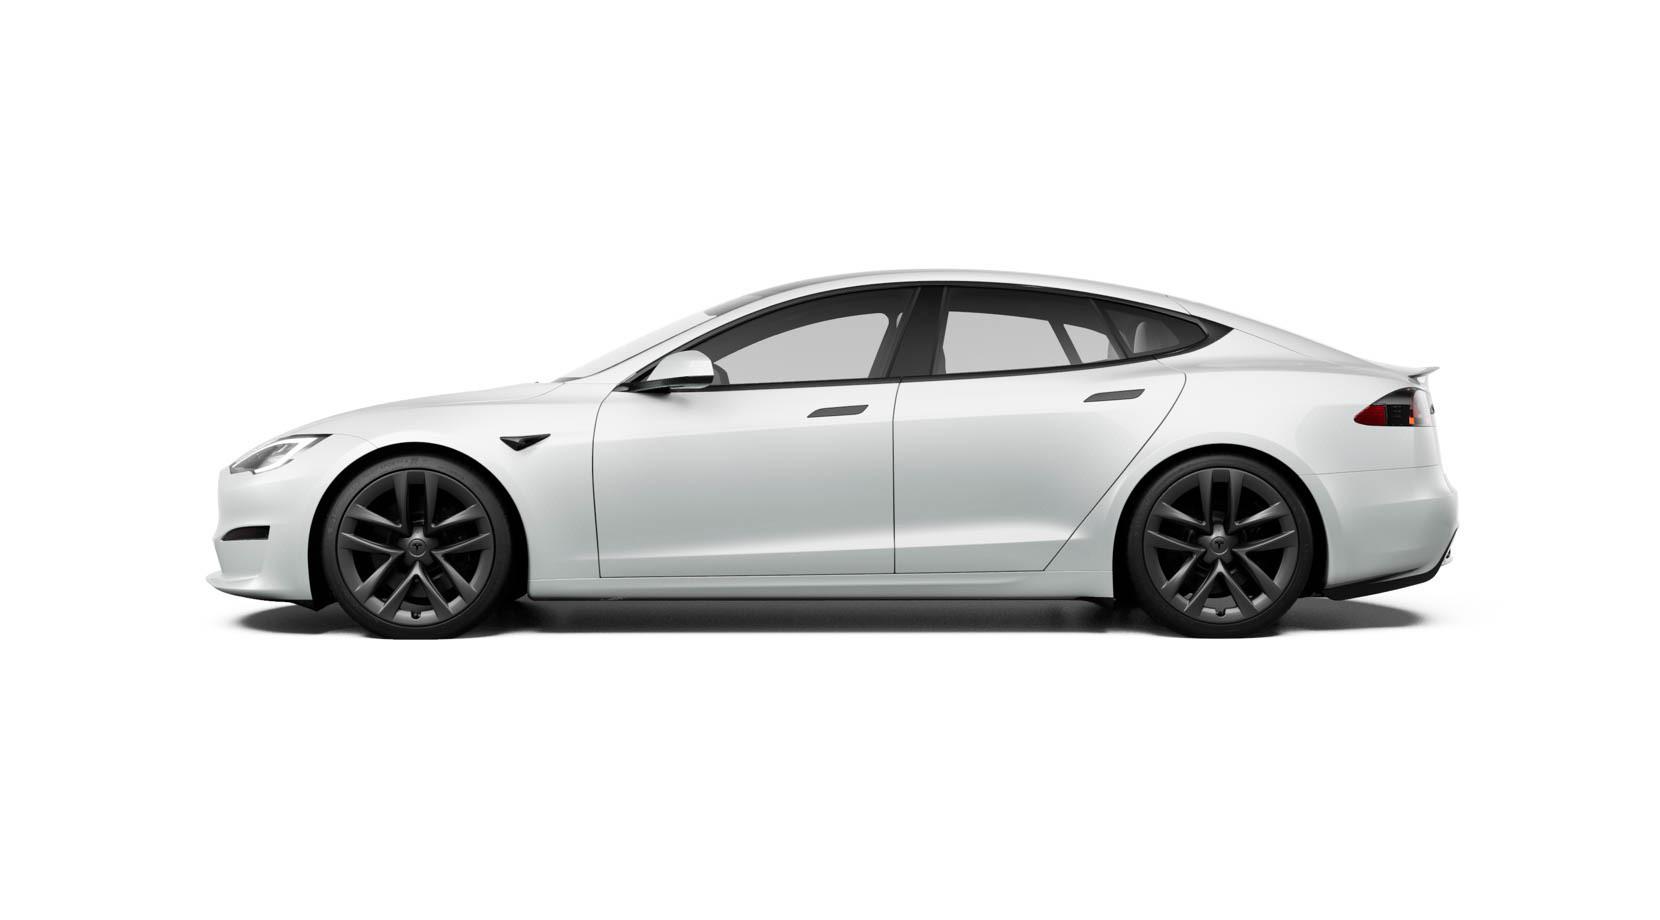 Tesla models,tesla model s,tesla model s plaid,tesla model s interior,tesla model s,tesla model s performance,tesla model s plaid 0-60,tesla model s plaid price 2021 Tesla Model S Luxury car